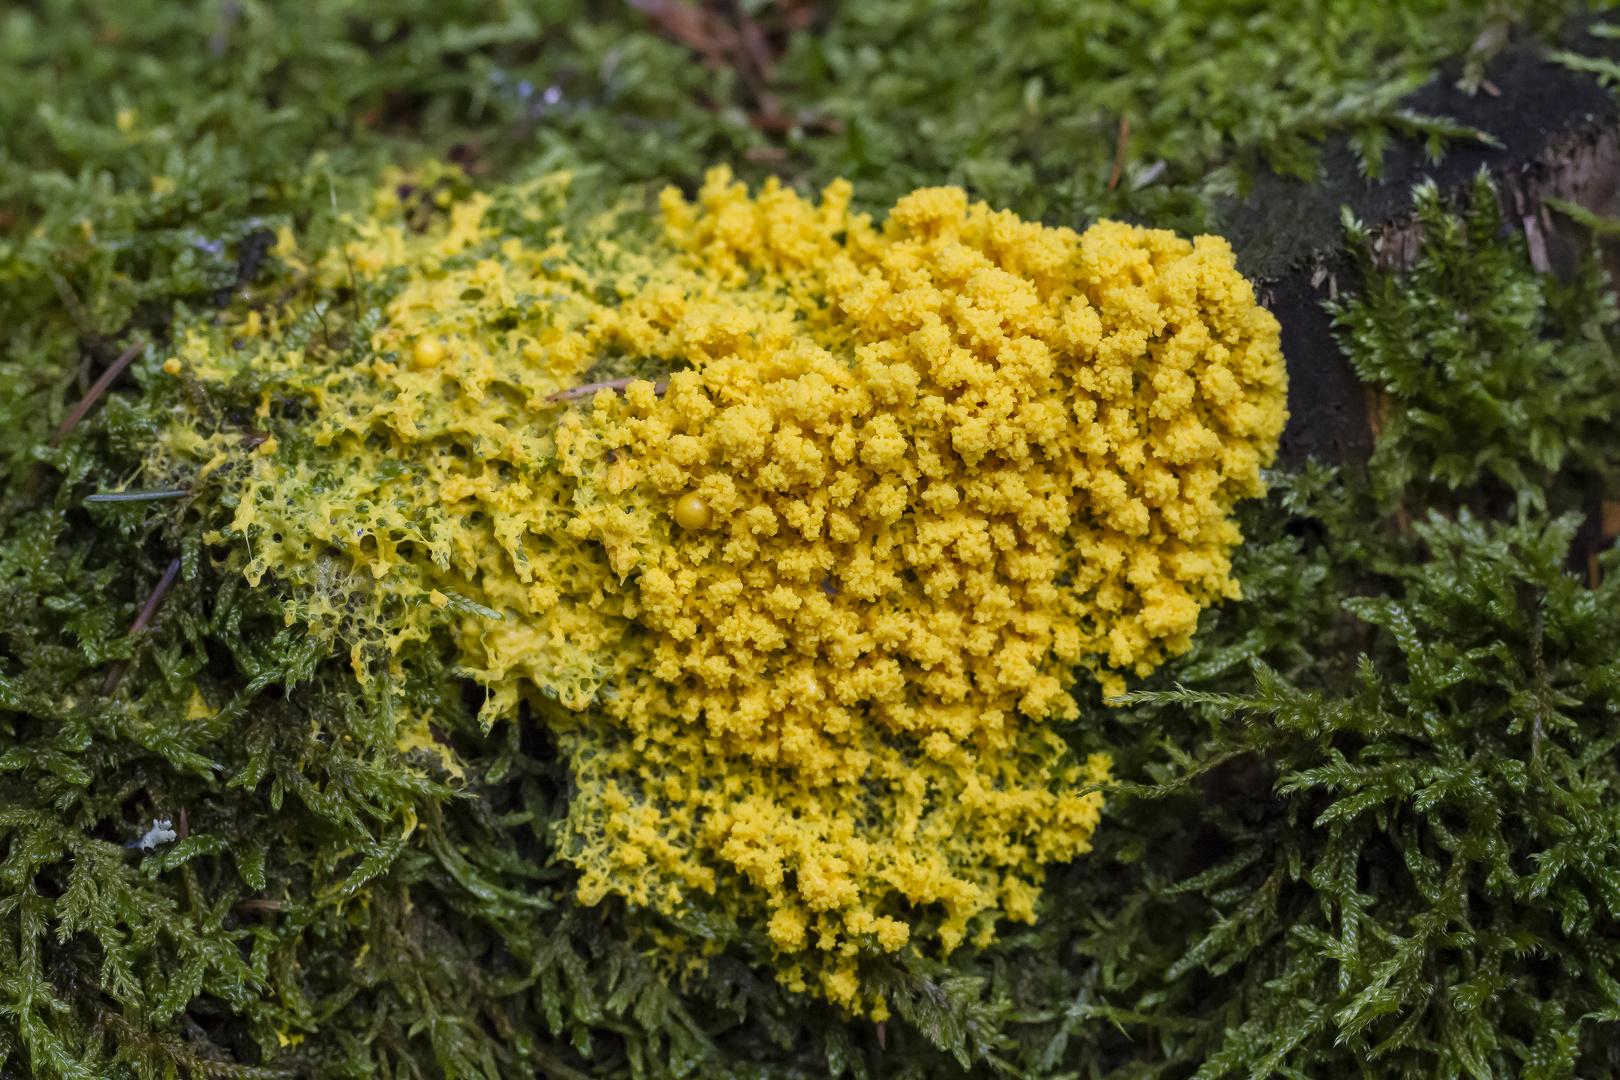 Gelbe Lohblüte (Schleimpilz)